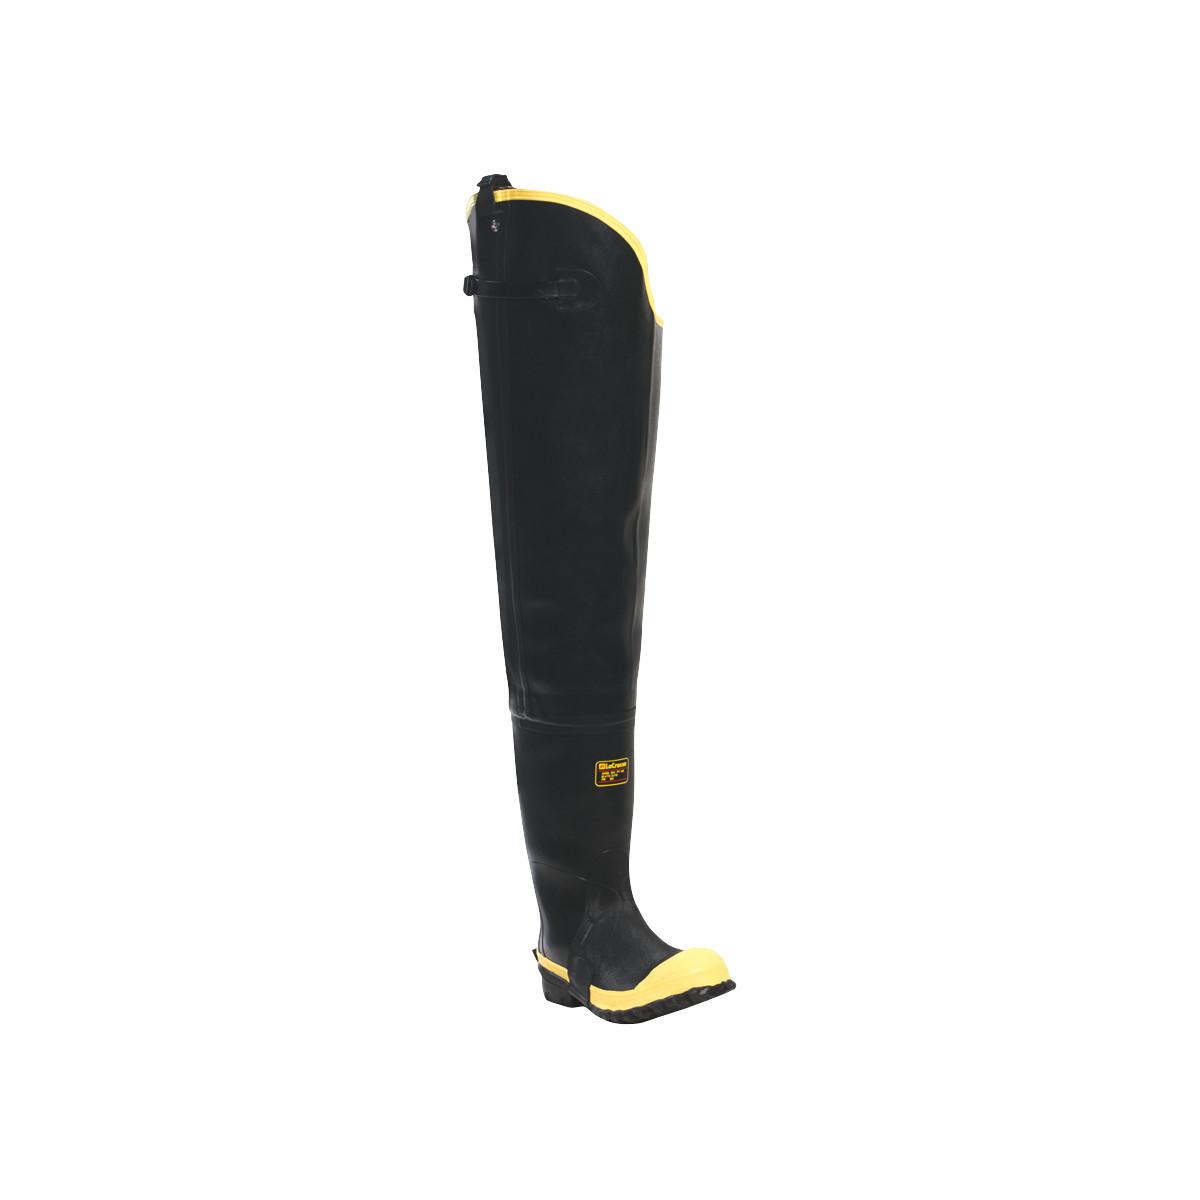 810d6f0d0a6 LaCrosse Men's Insulated Storm Hip Boot 31